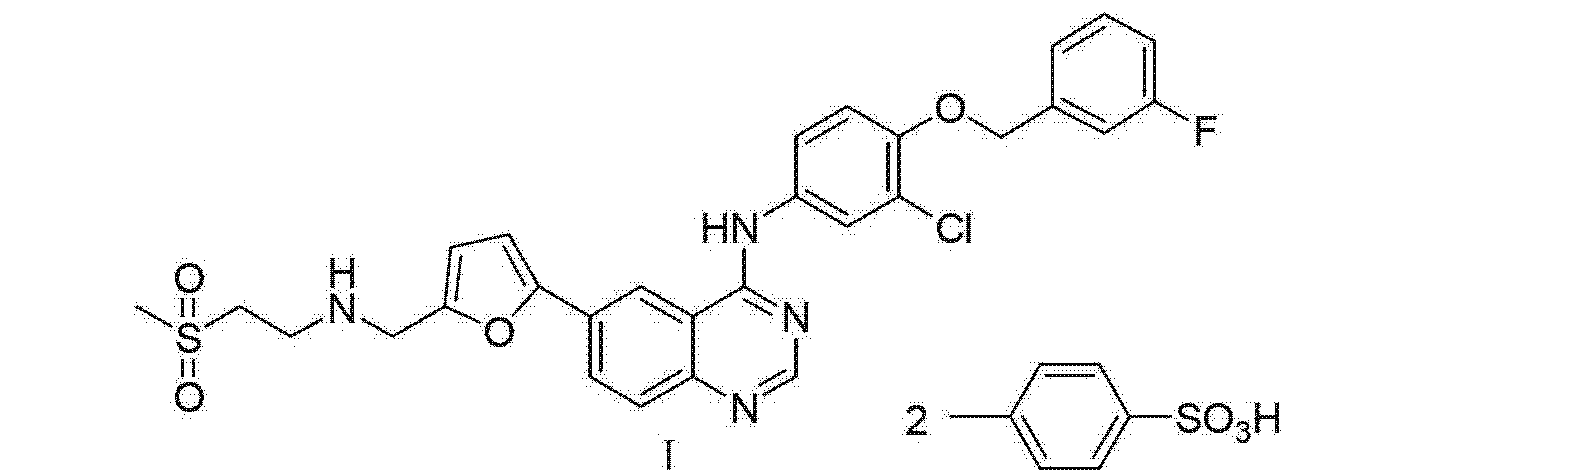 Figure CN103159747AD00031